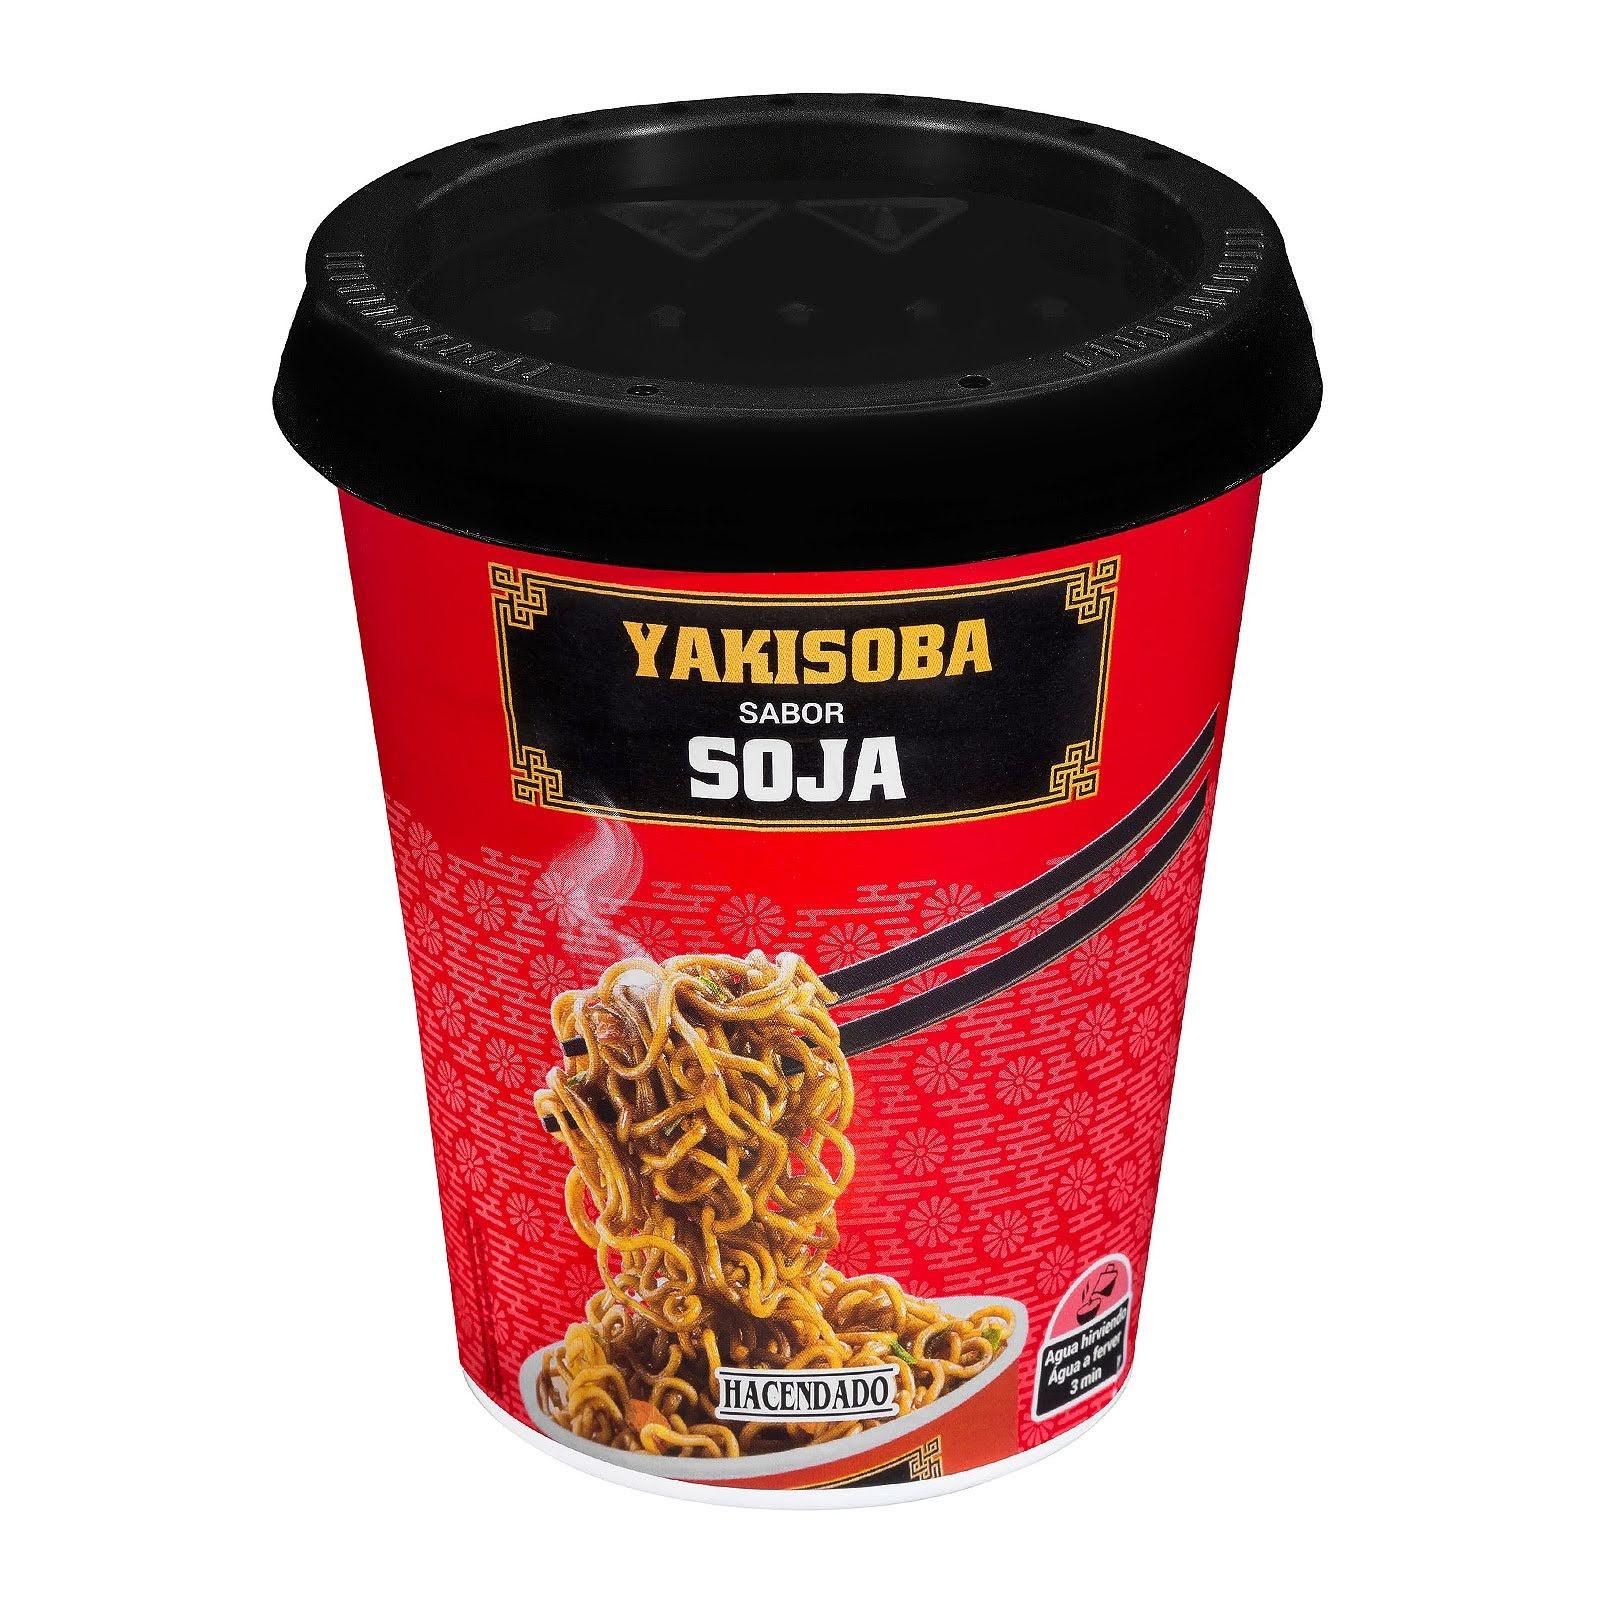 Yakisoba sabor soja Hacendado